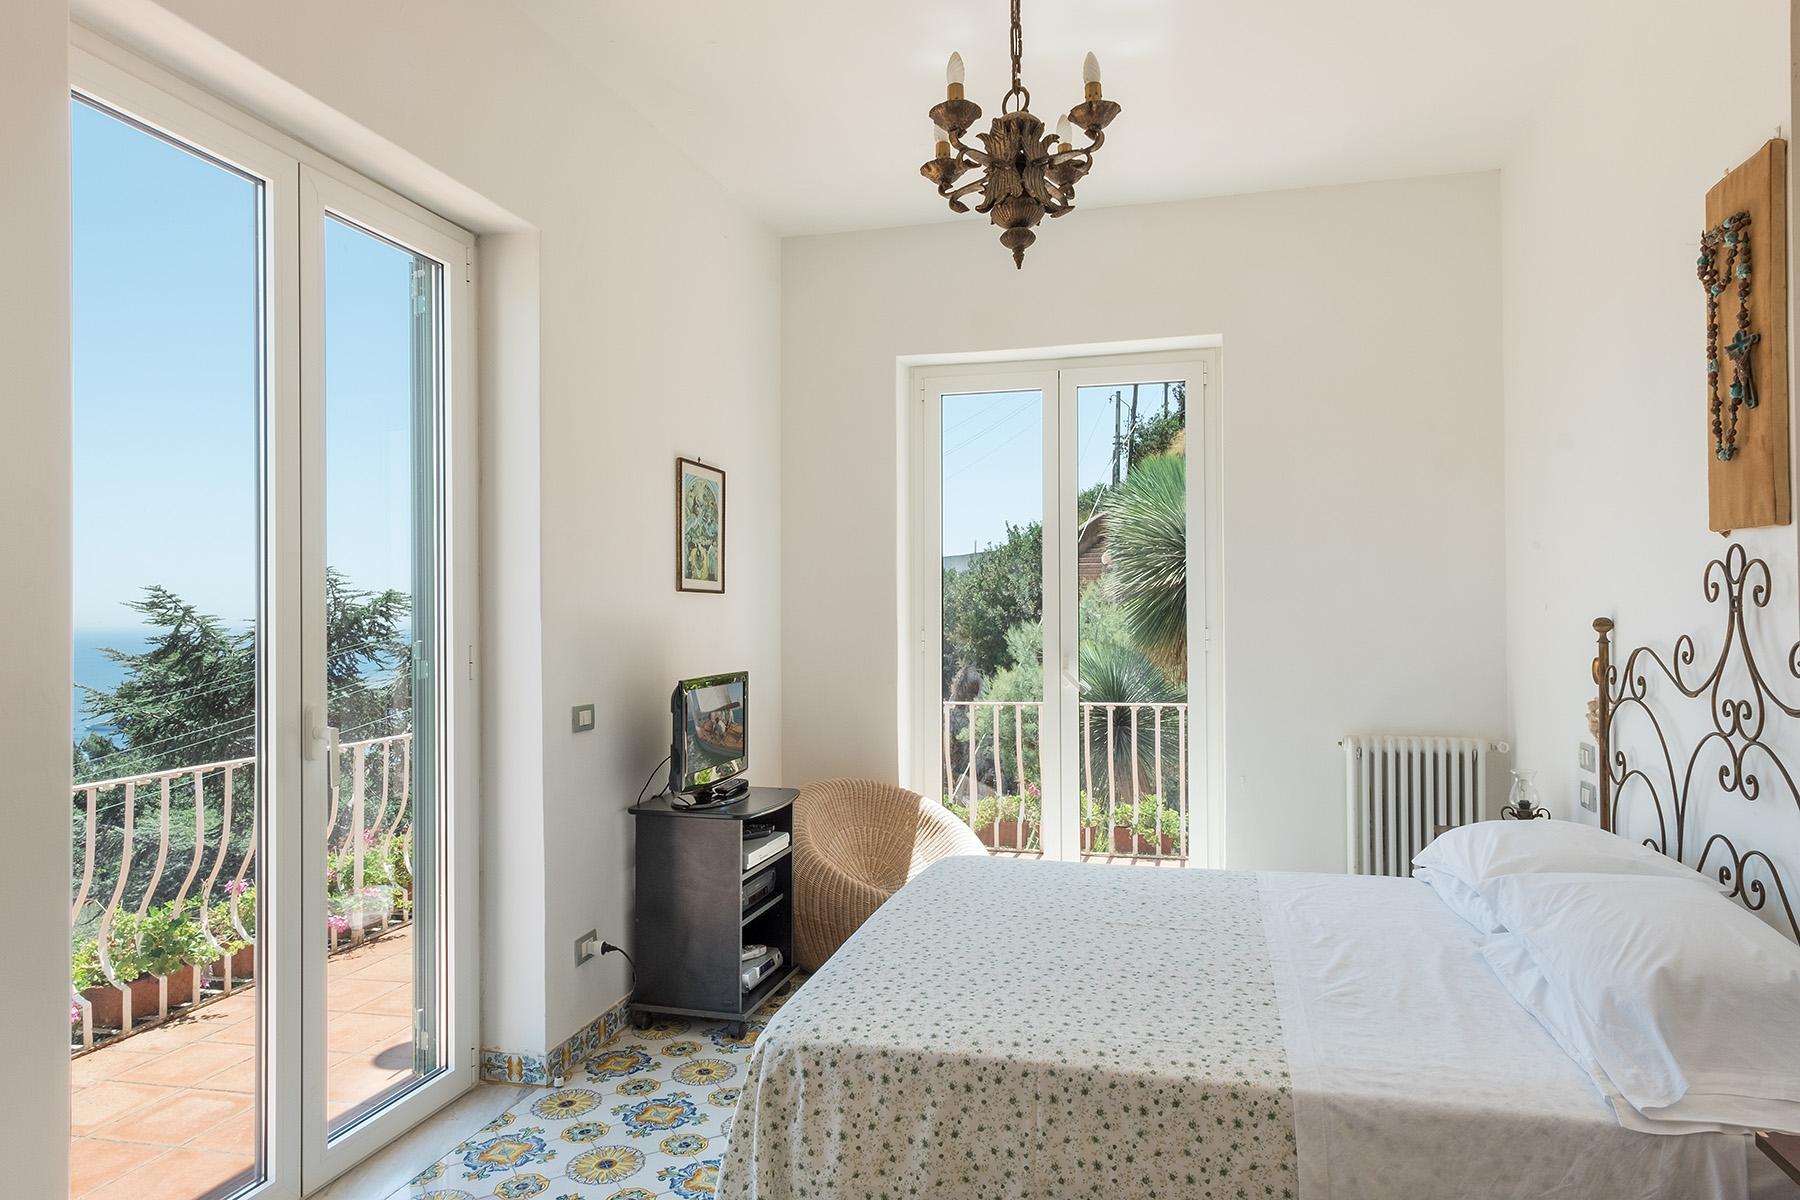 Прекрасная вилла с панорамным видом на море в центре легендарного острова Капри, Италия - 13